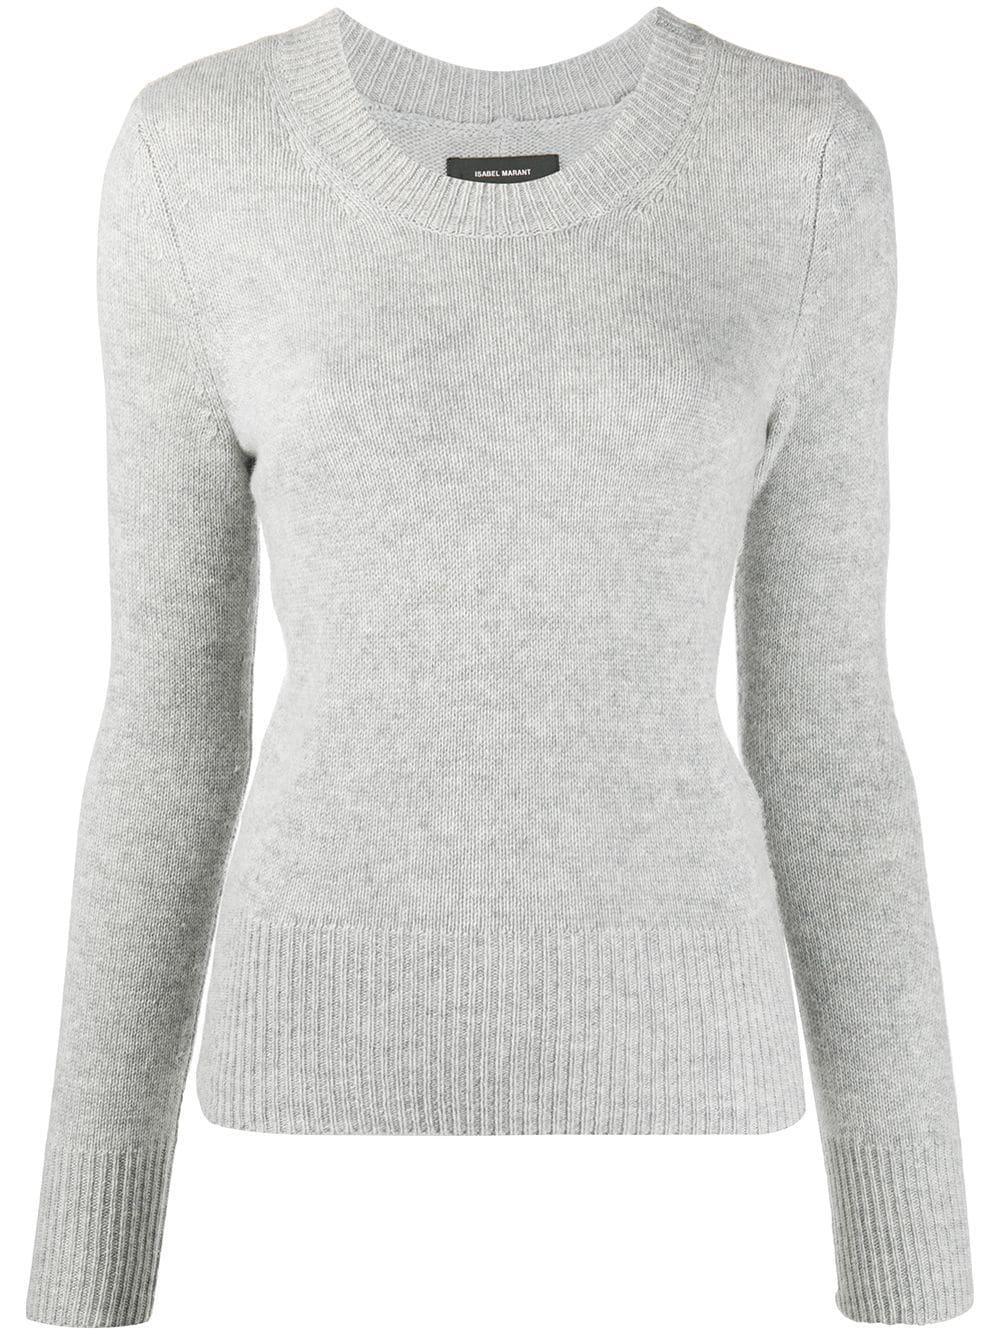 Depson Cashmere Sweater